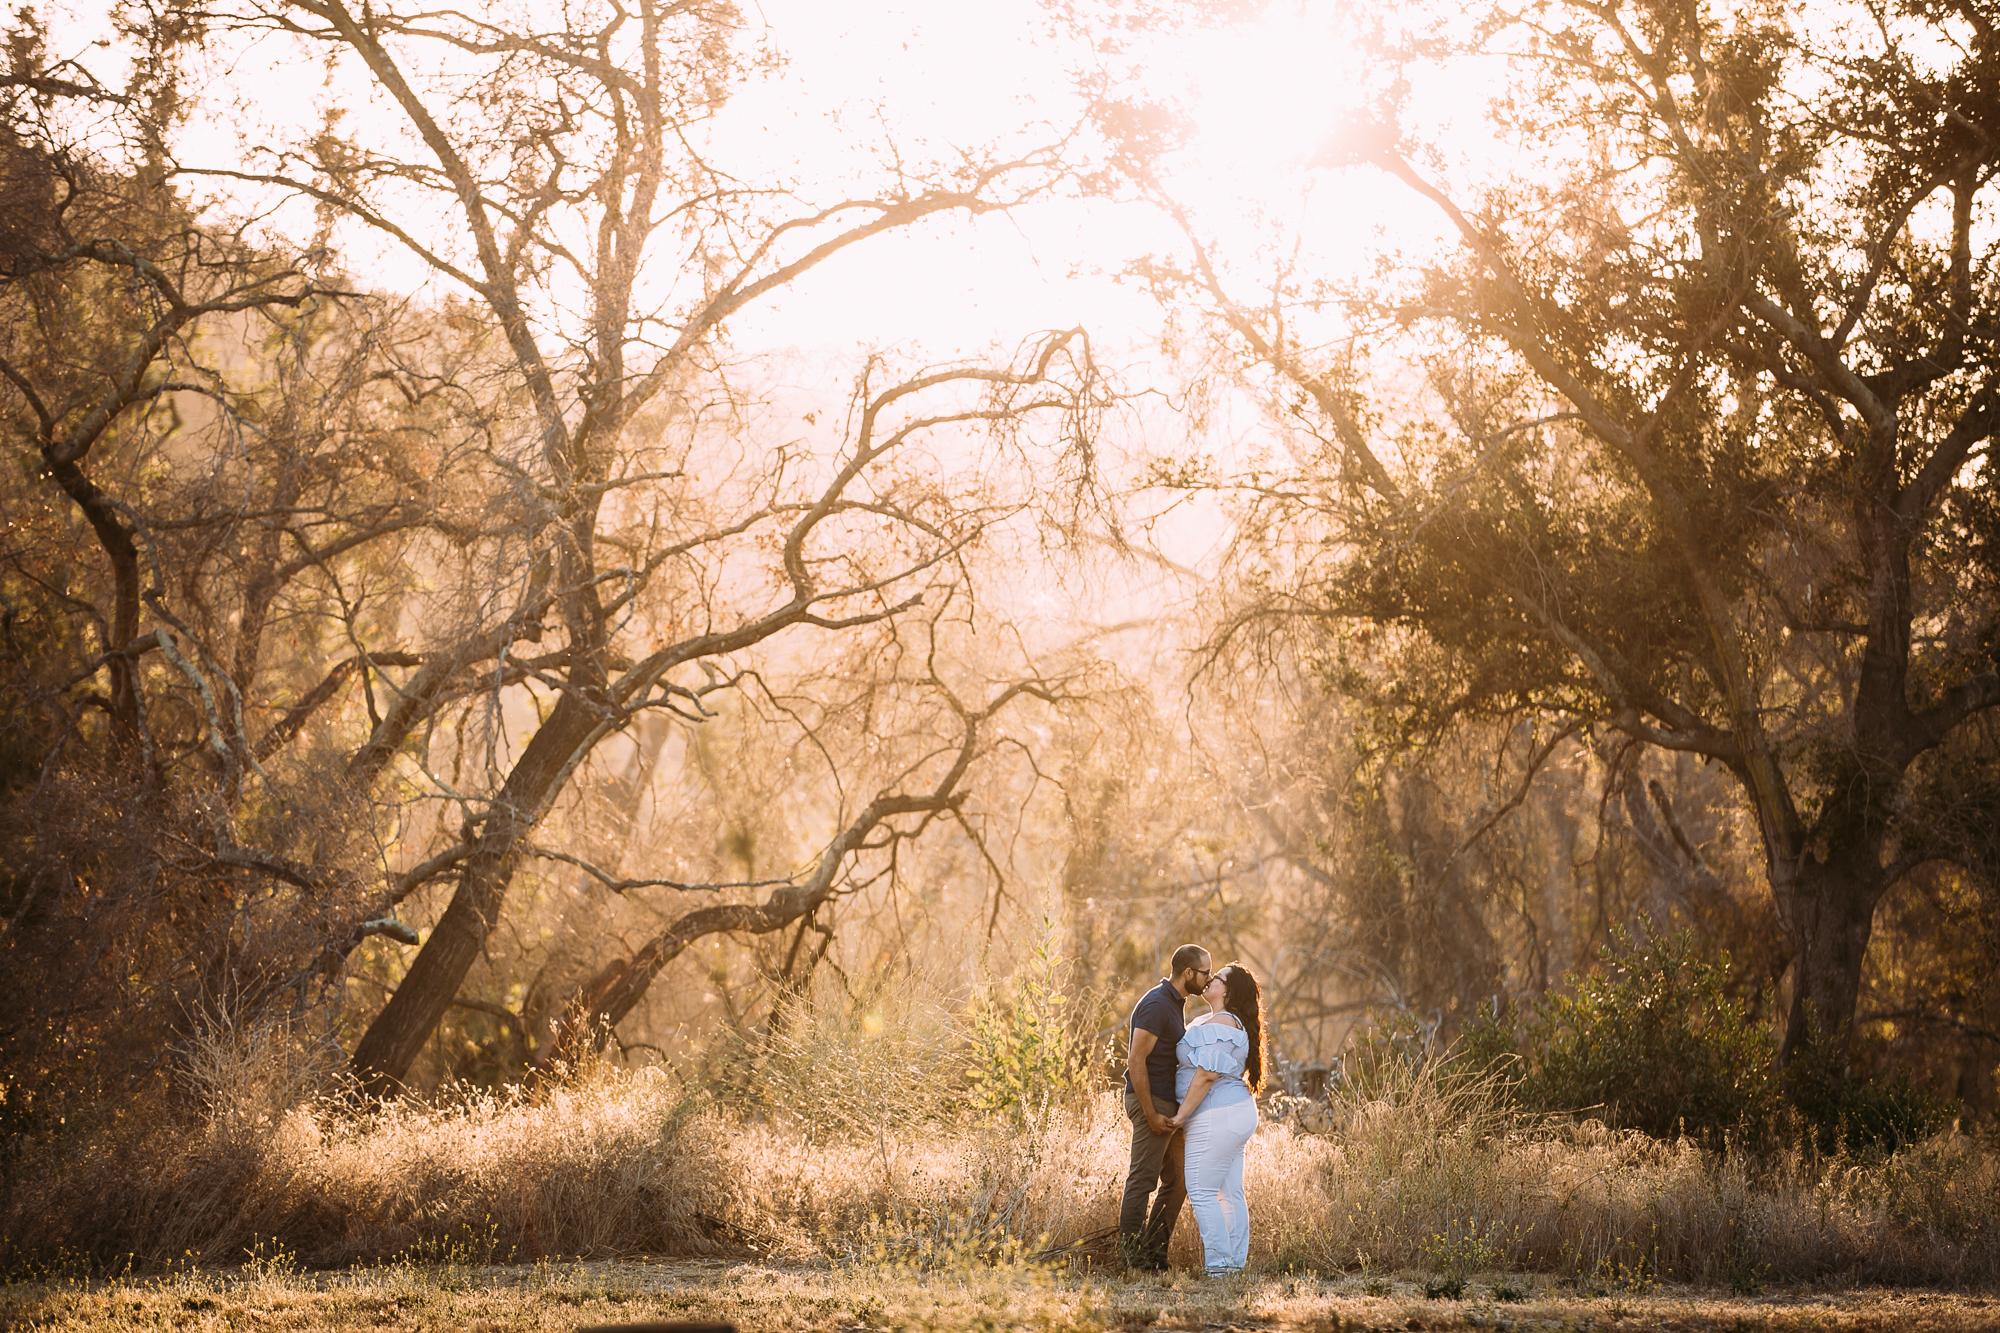 CK-Orange-County-Caspers-Park-Engagement-Photography 63.jpg